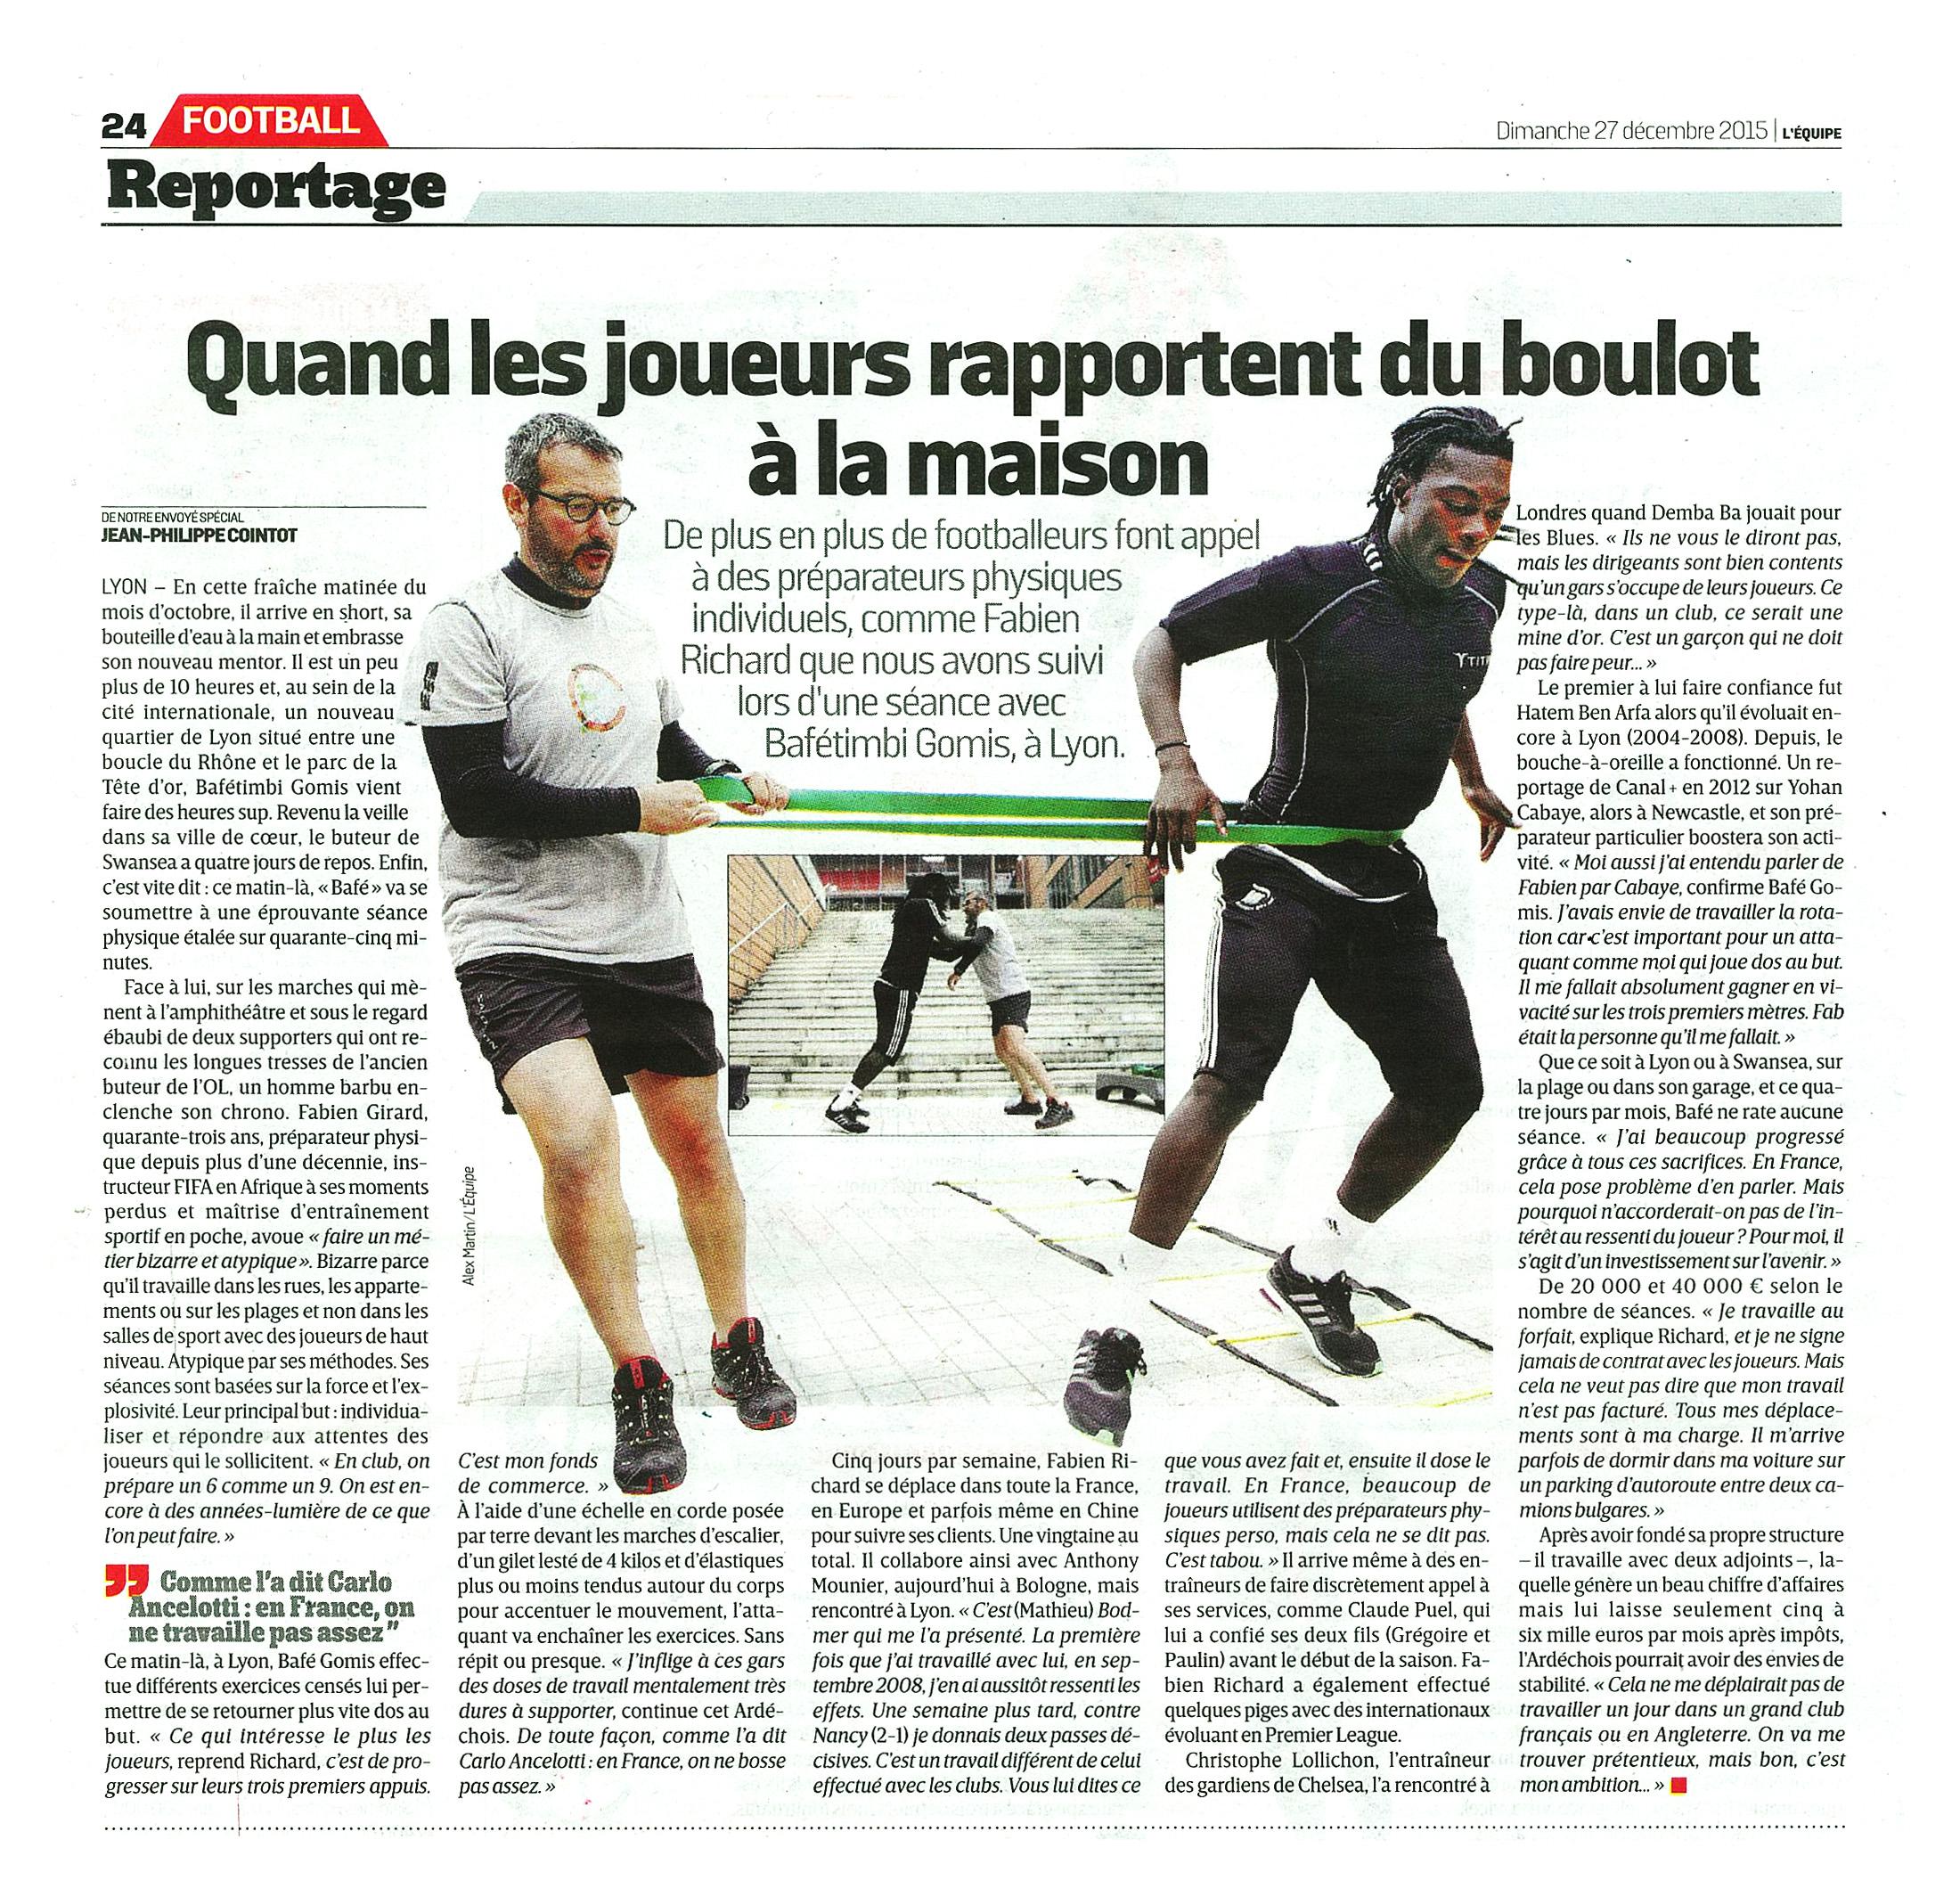 article L'Équipe